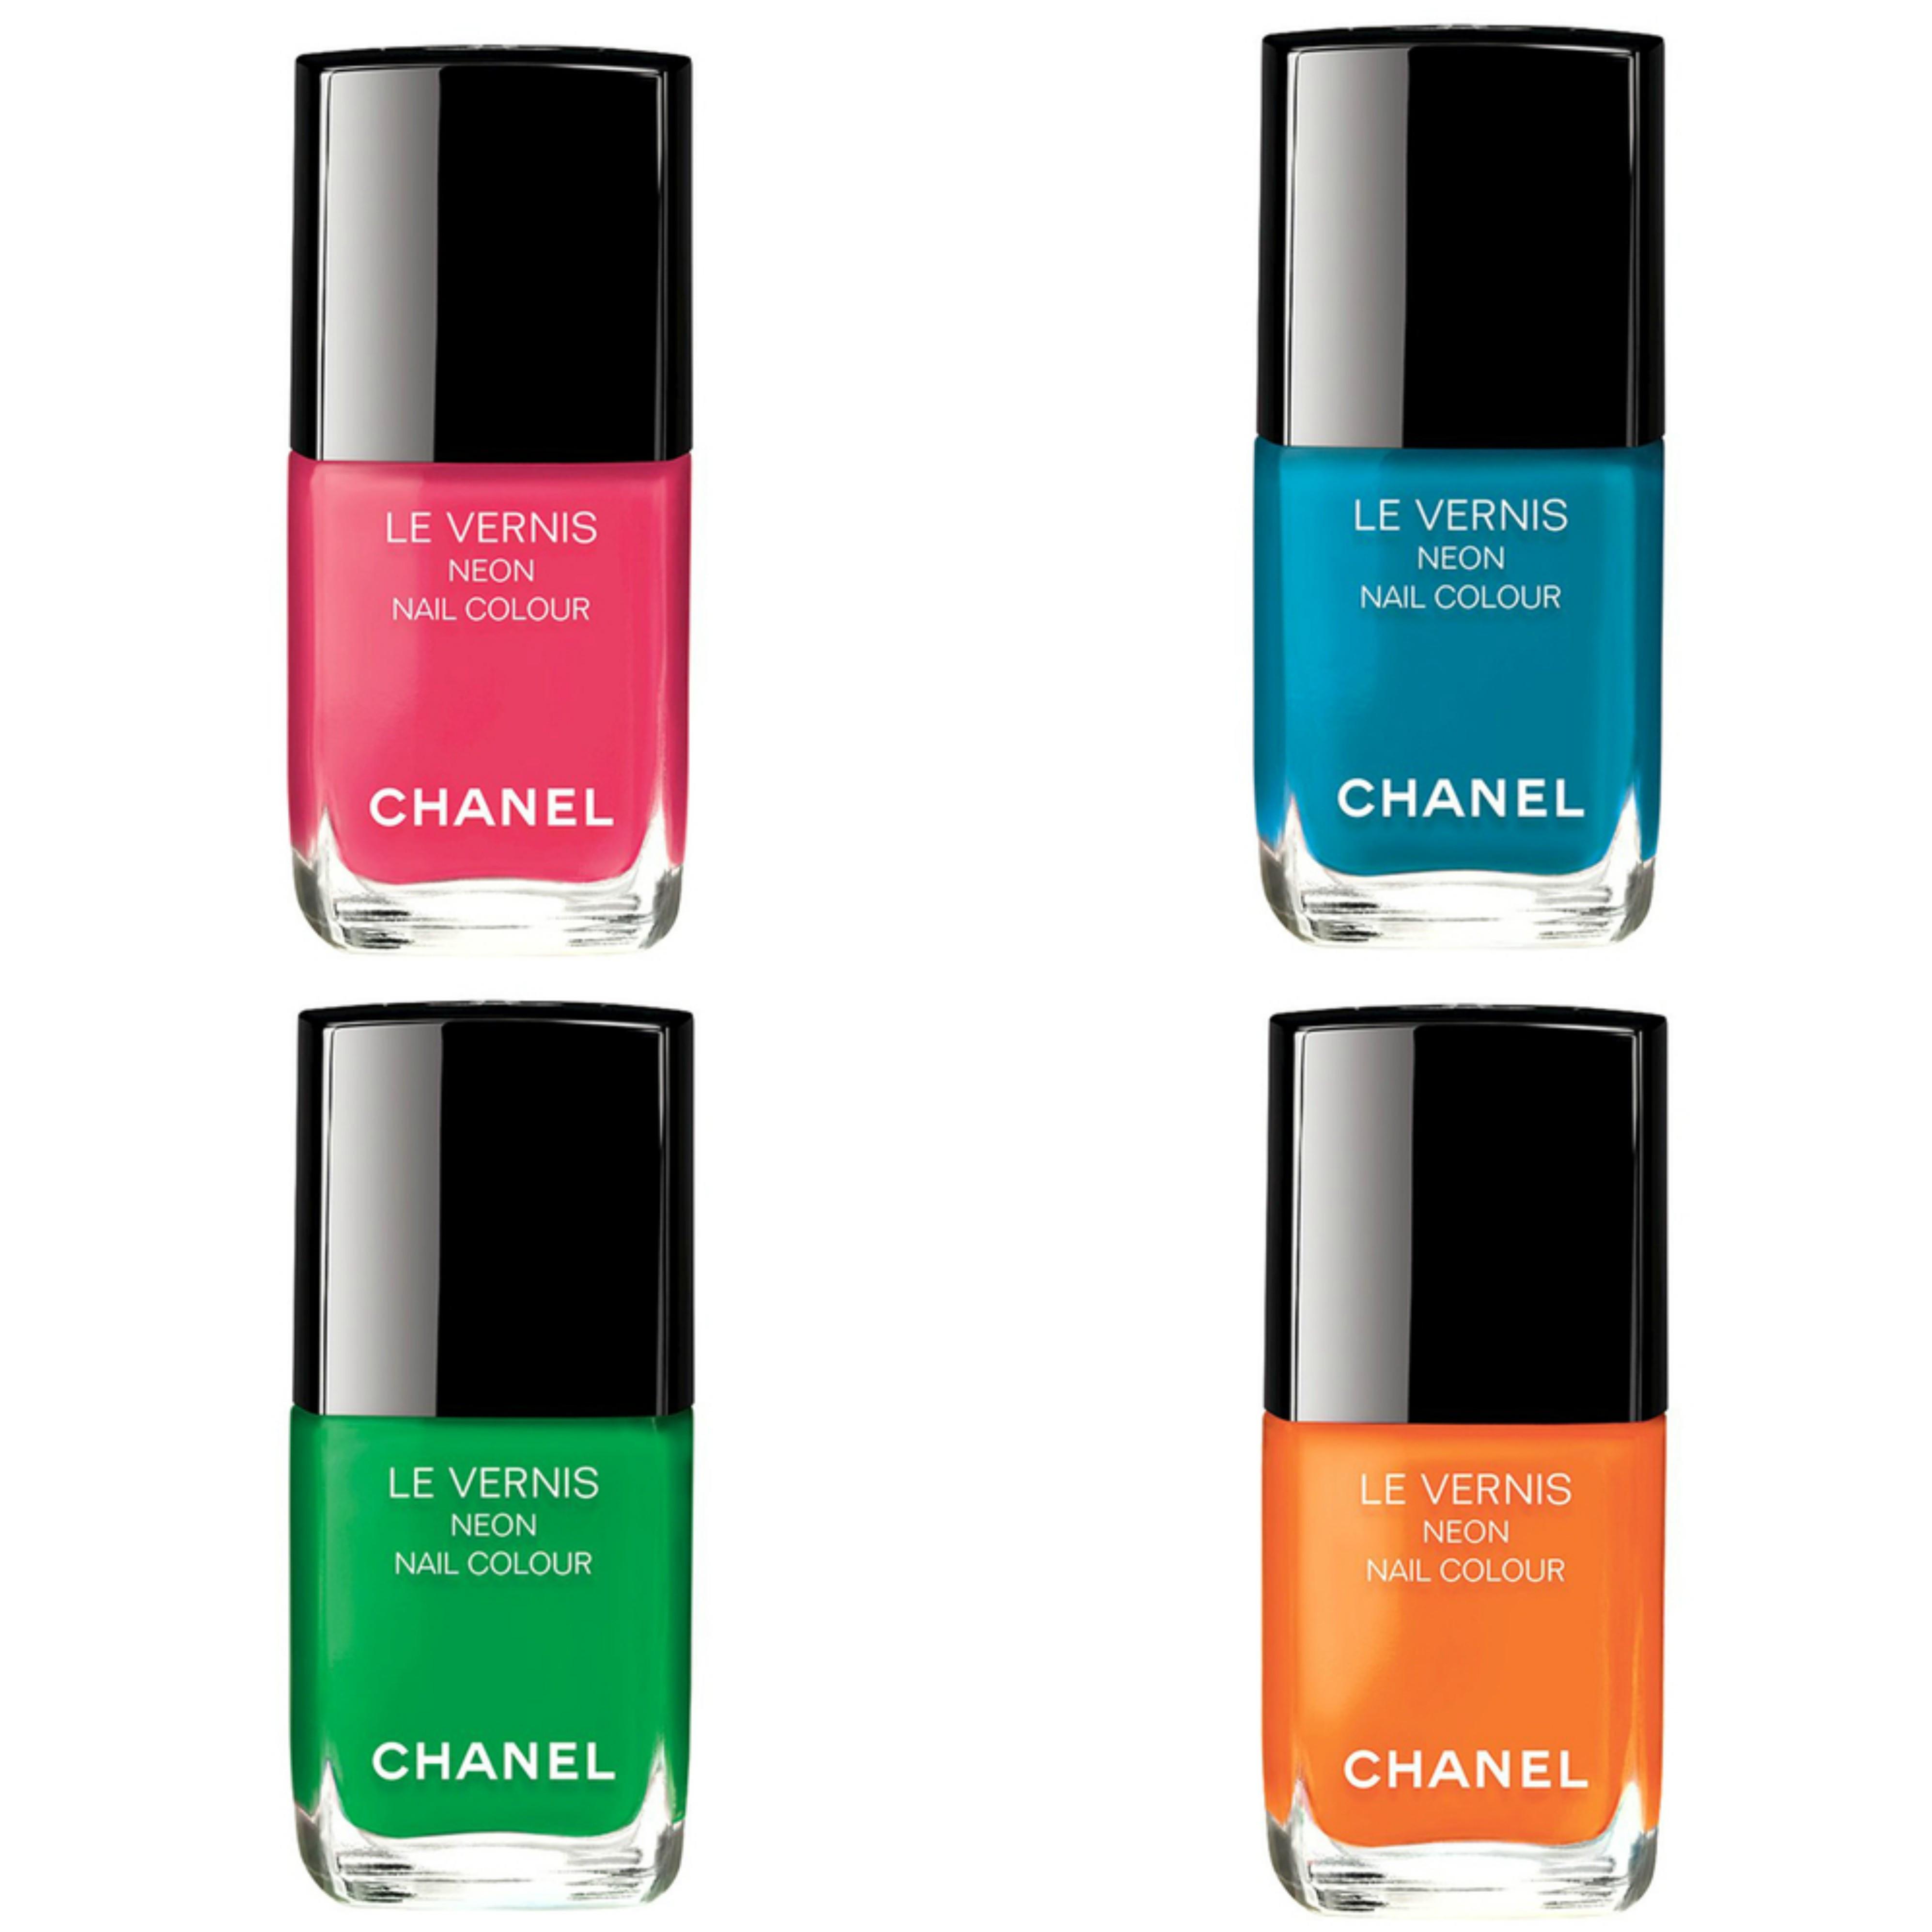 Chanel Le Vernis Neon Nail Color | Makeup | BeautyAlmanac